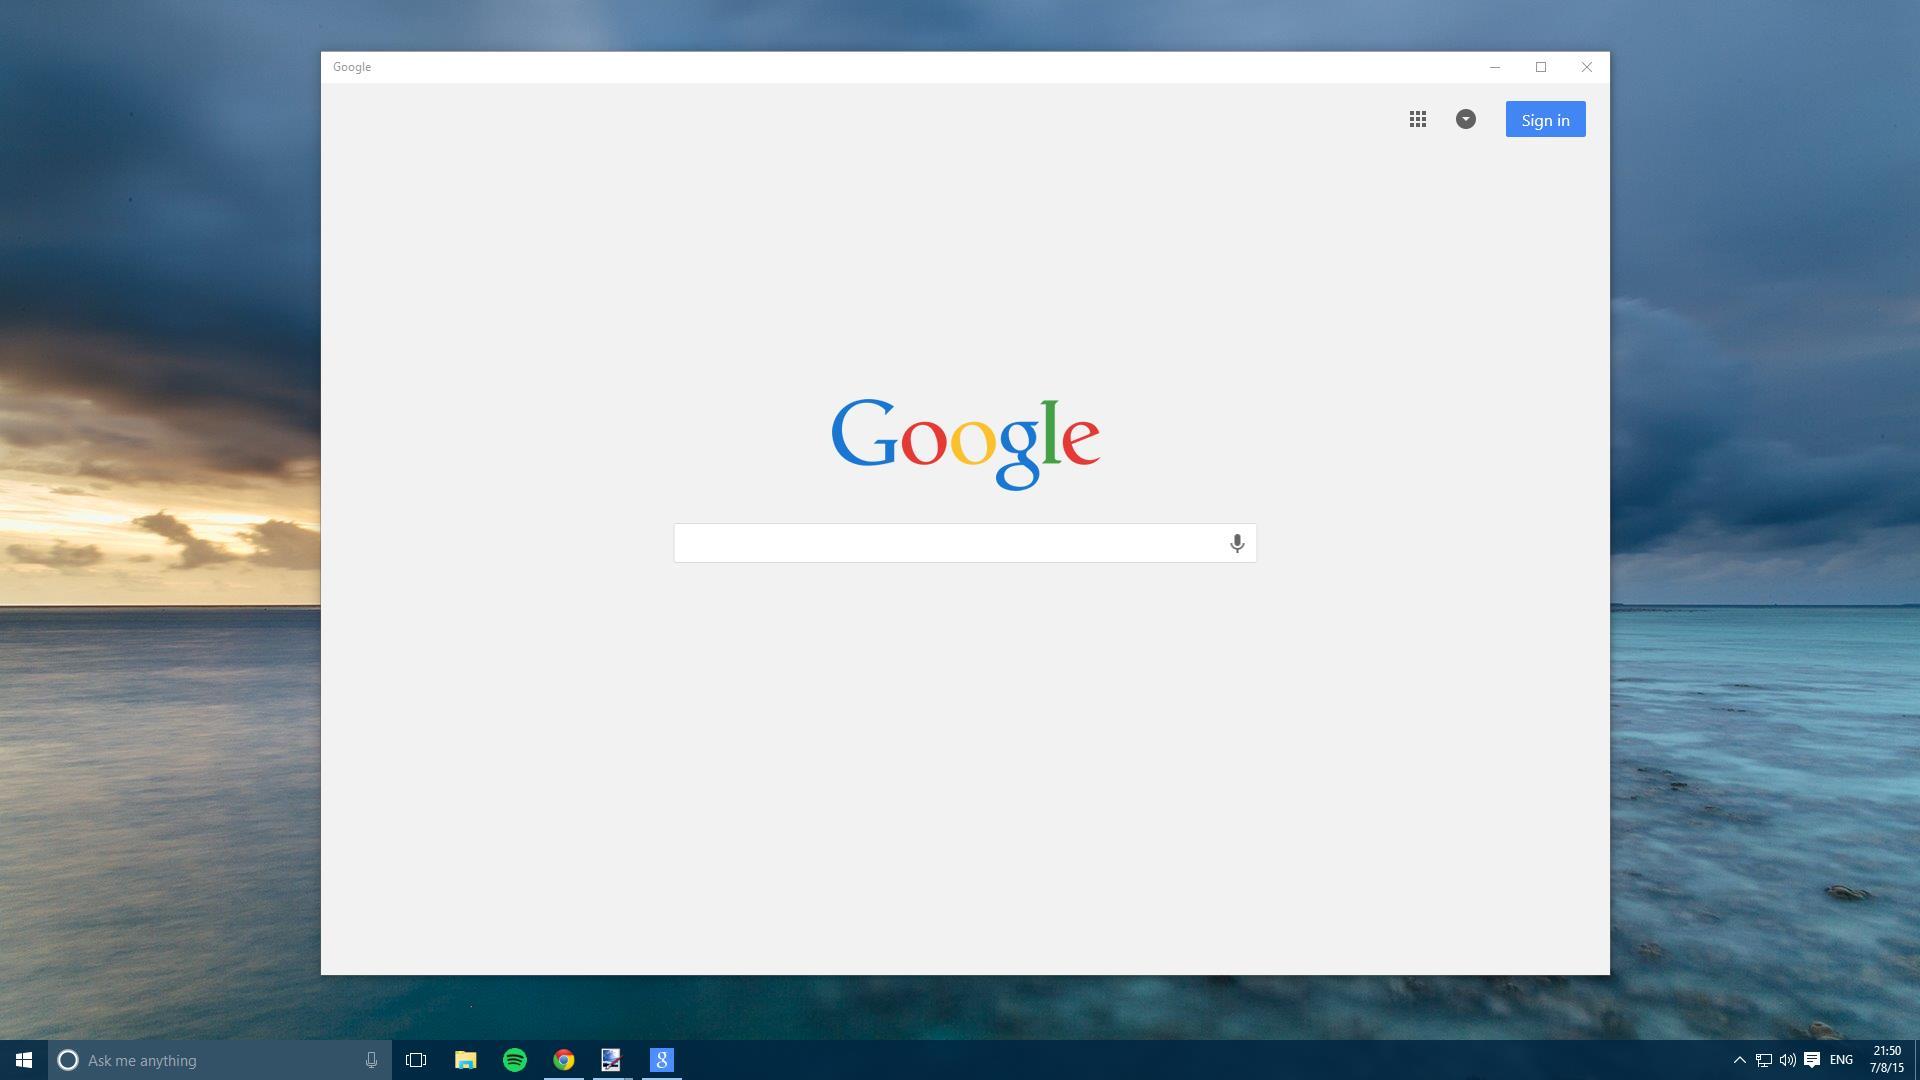 Windows 10 Wallpaper App